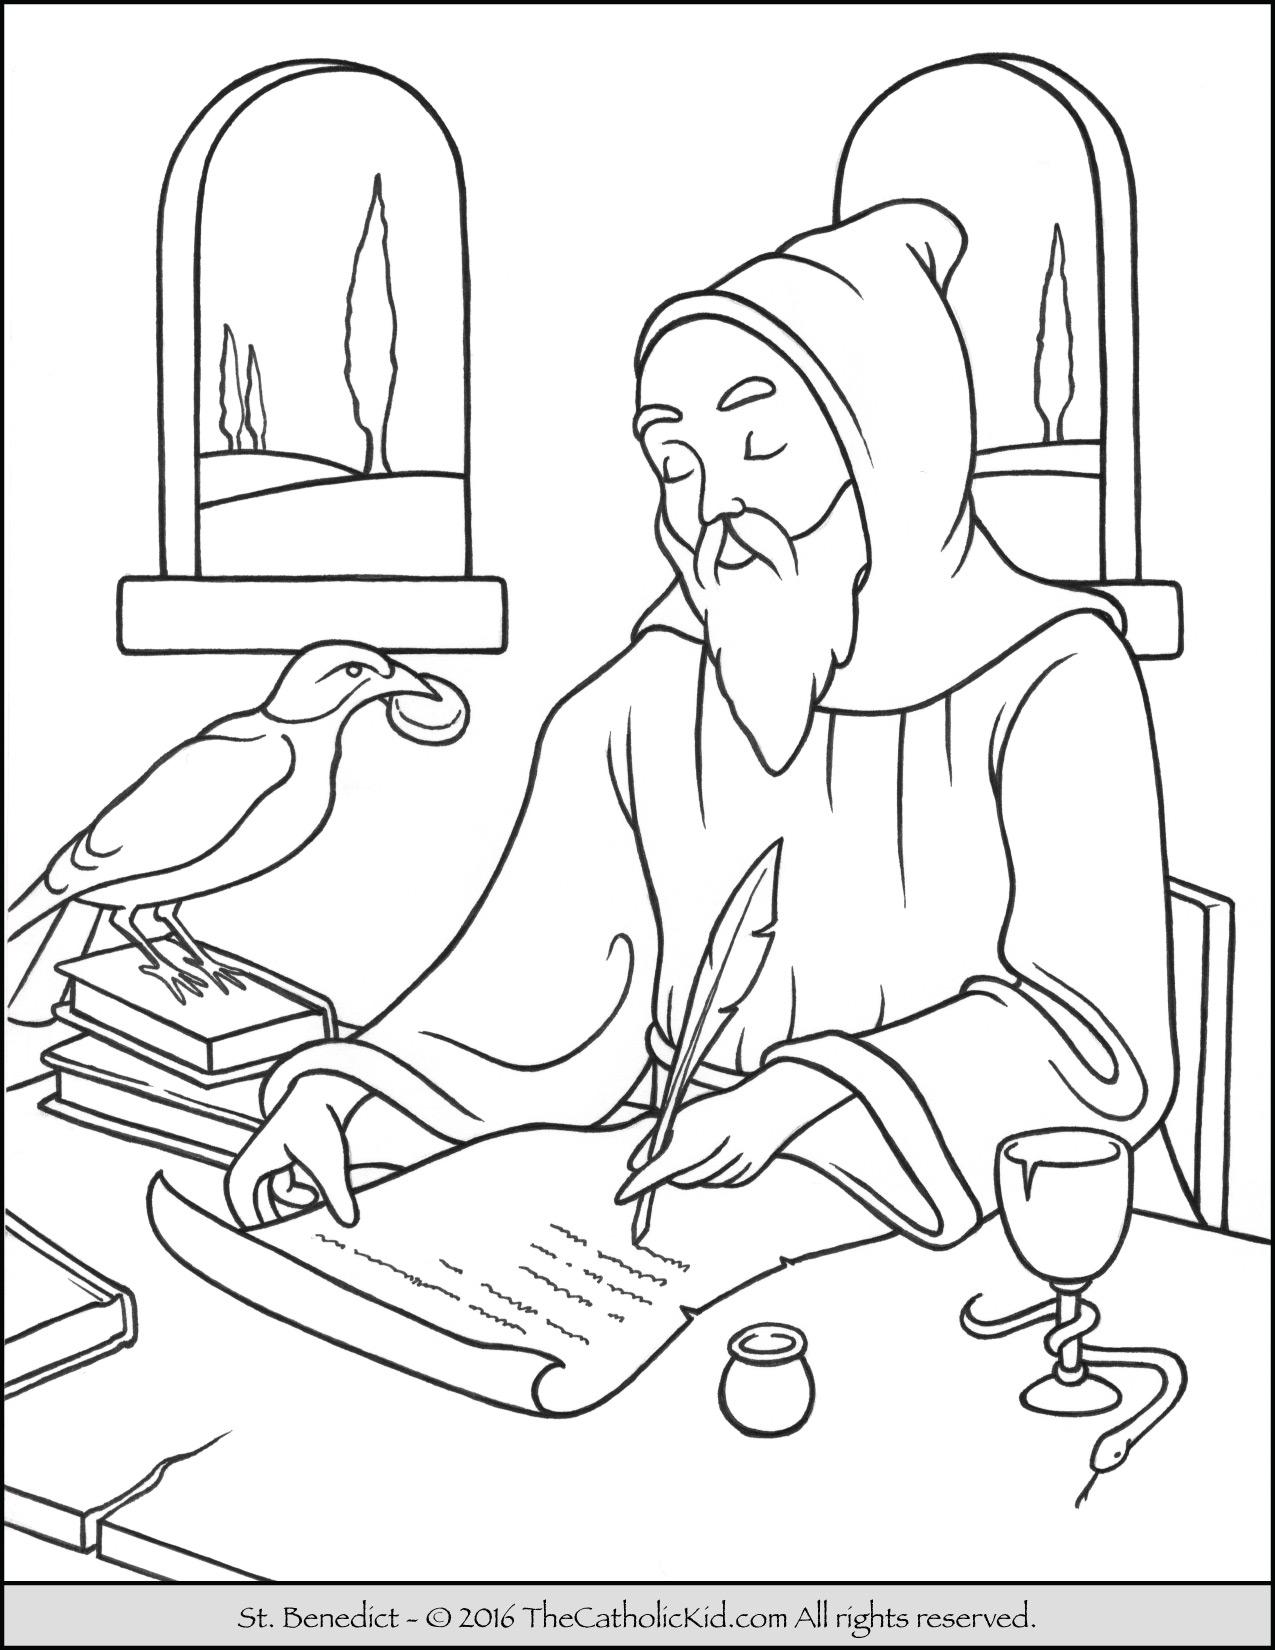 Saint Bernard Coloring Pages At Getcolorings